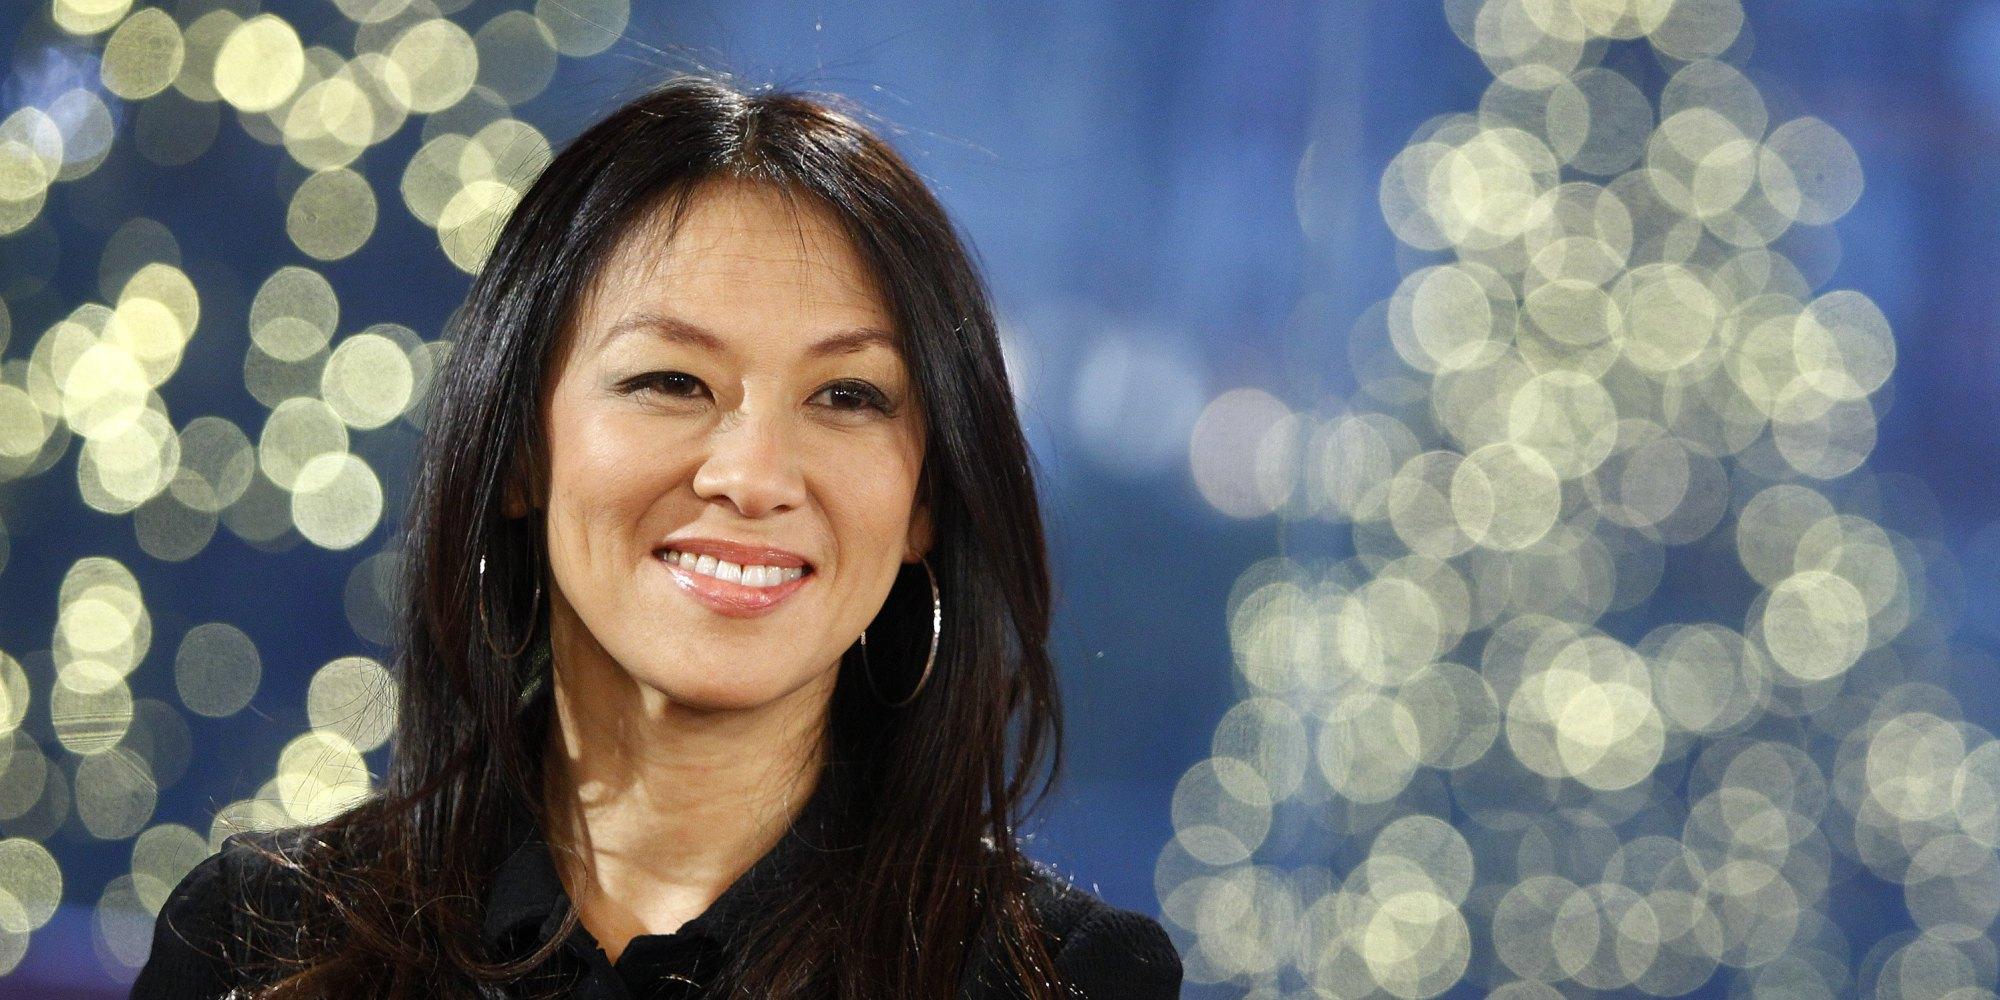 Tiger Mom Vs Brooklyn Dragon I Hereby Challenge Amy Chua